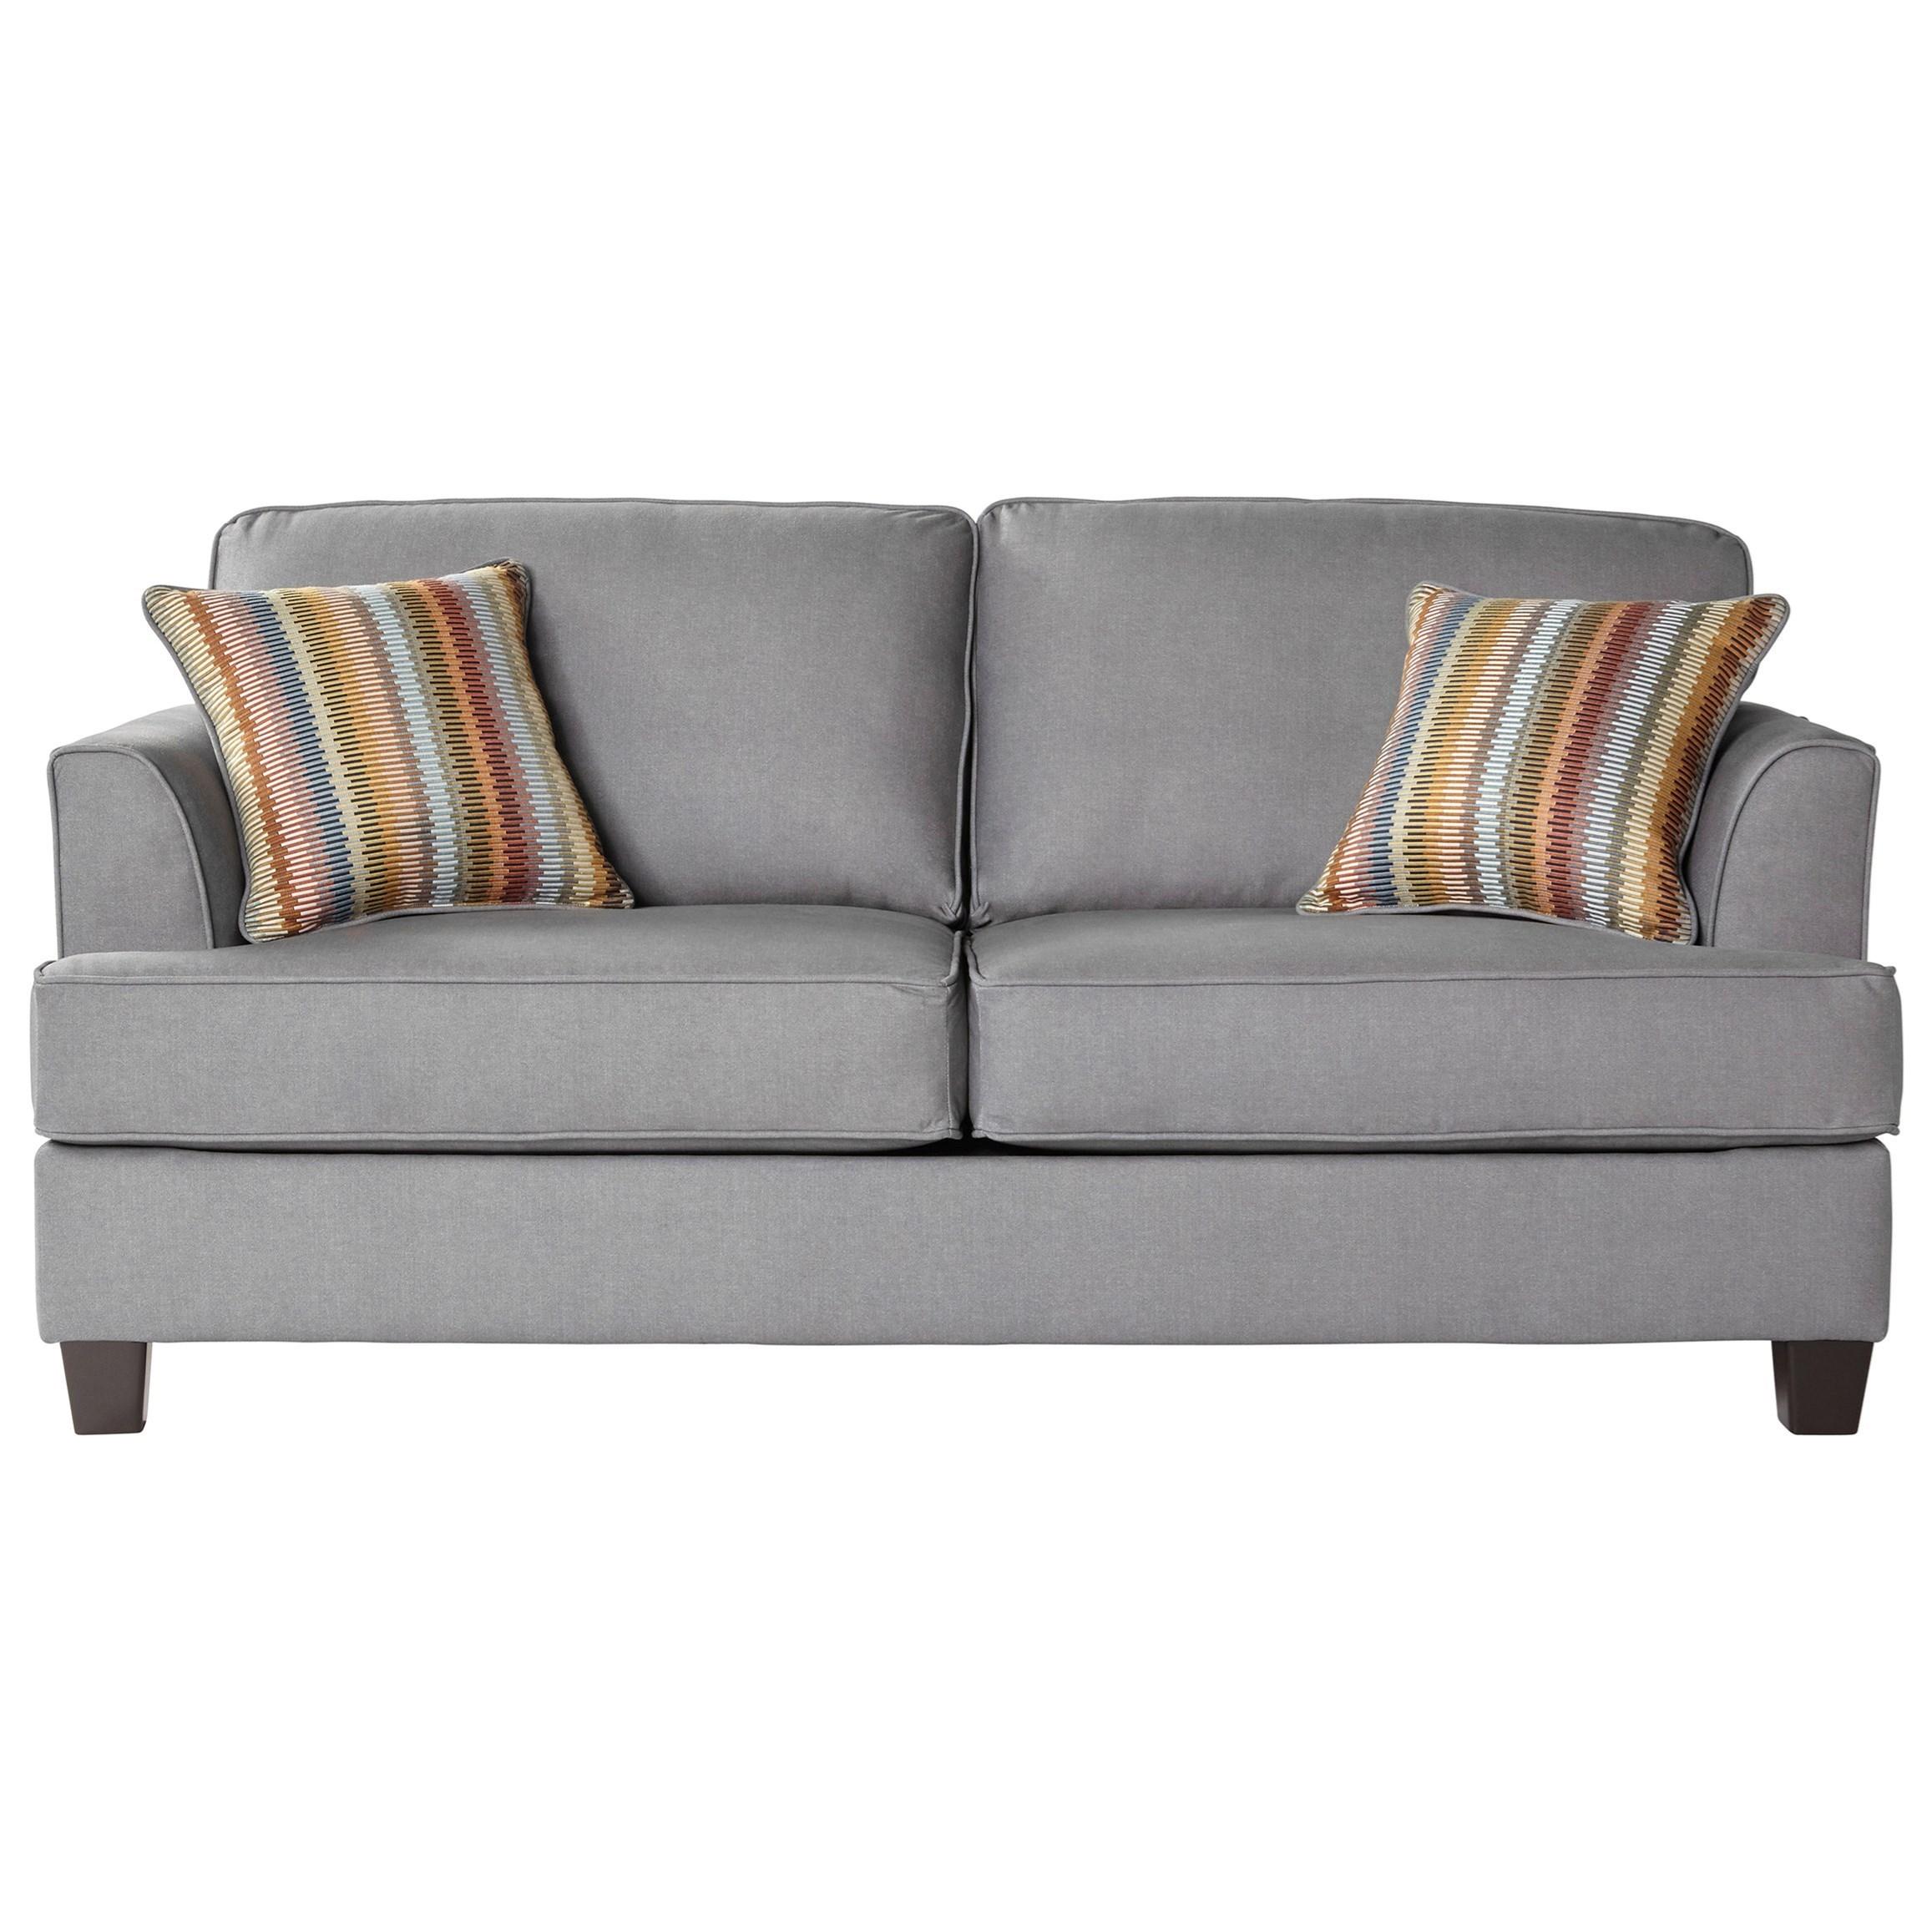 Pleasing Serta Upholstery By Hughes Furniture 5650 Transitional 2 Home Interior And Landscaping Sapresignezvosmurscom